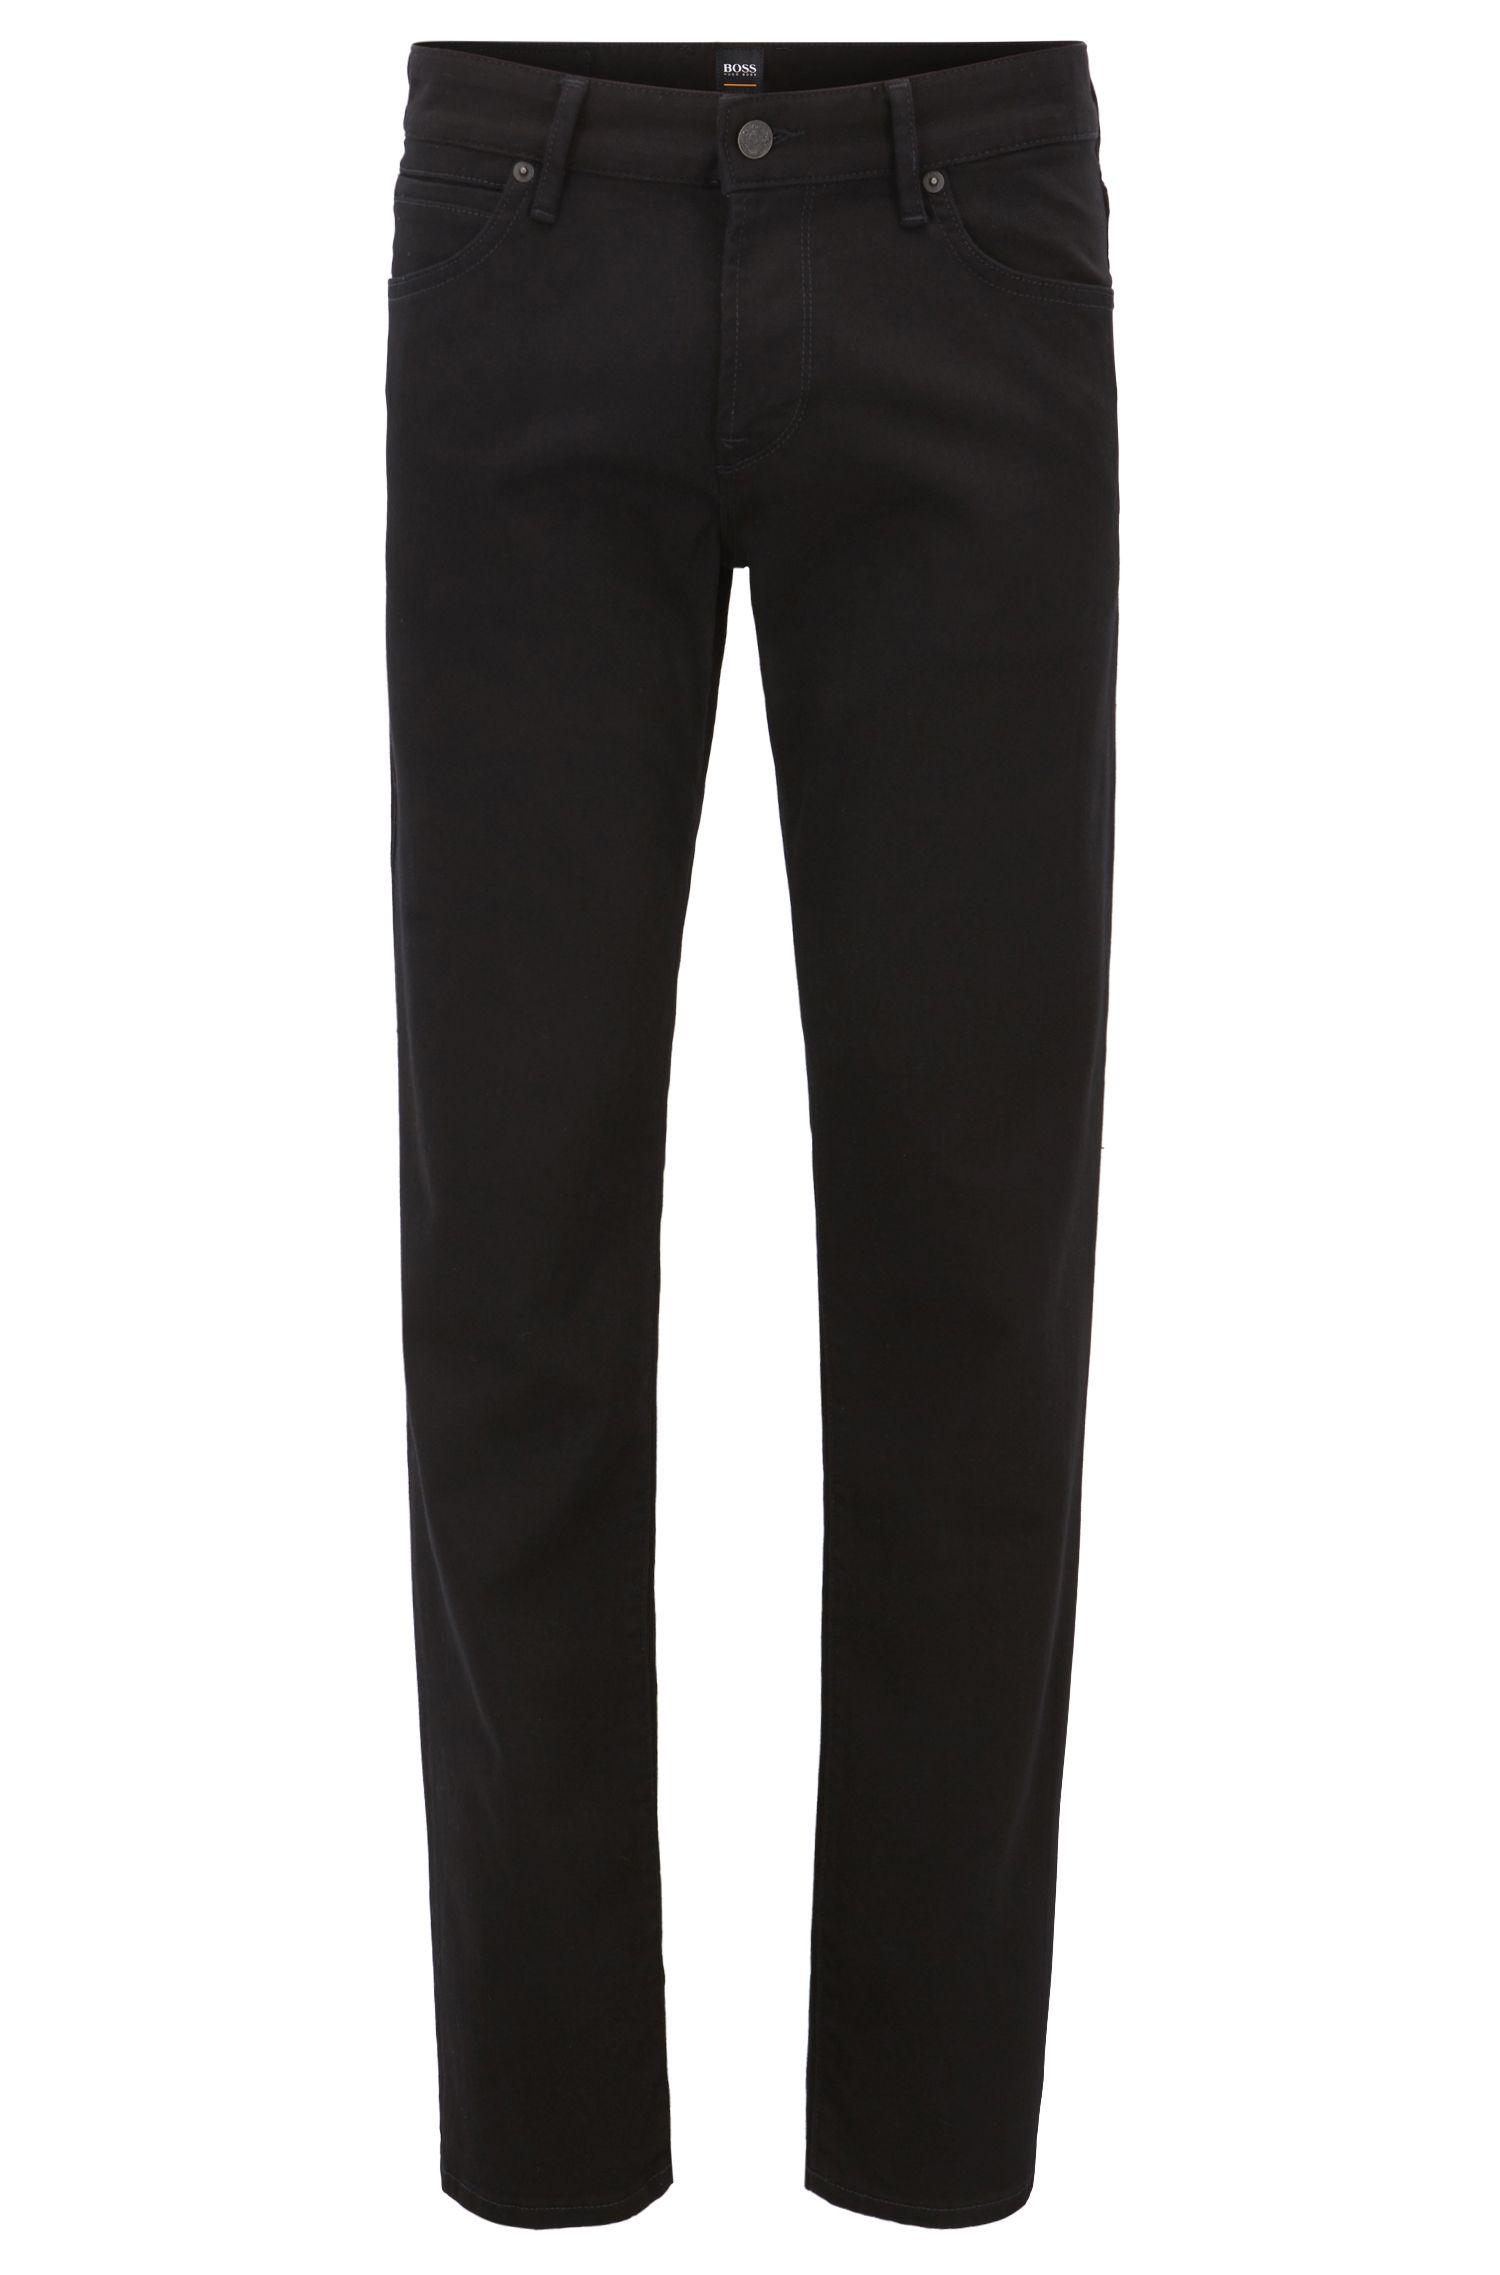 Jeans Regular Fit en denim noir Stay Black